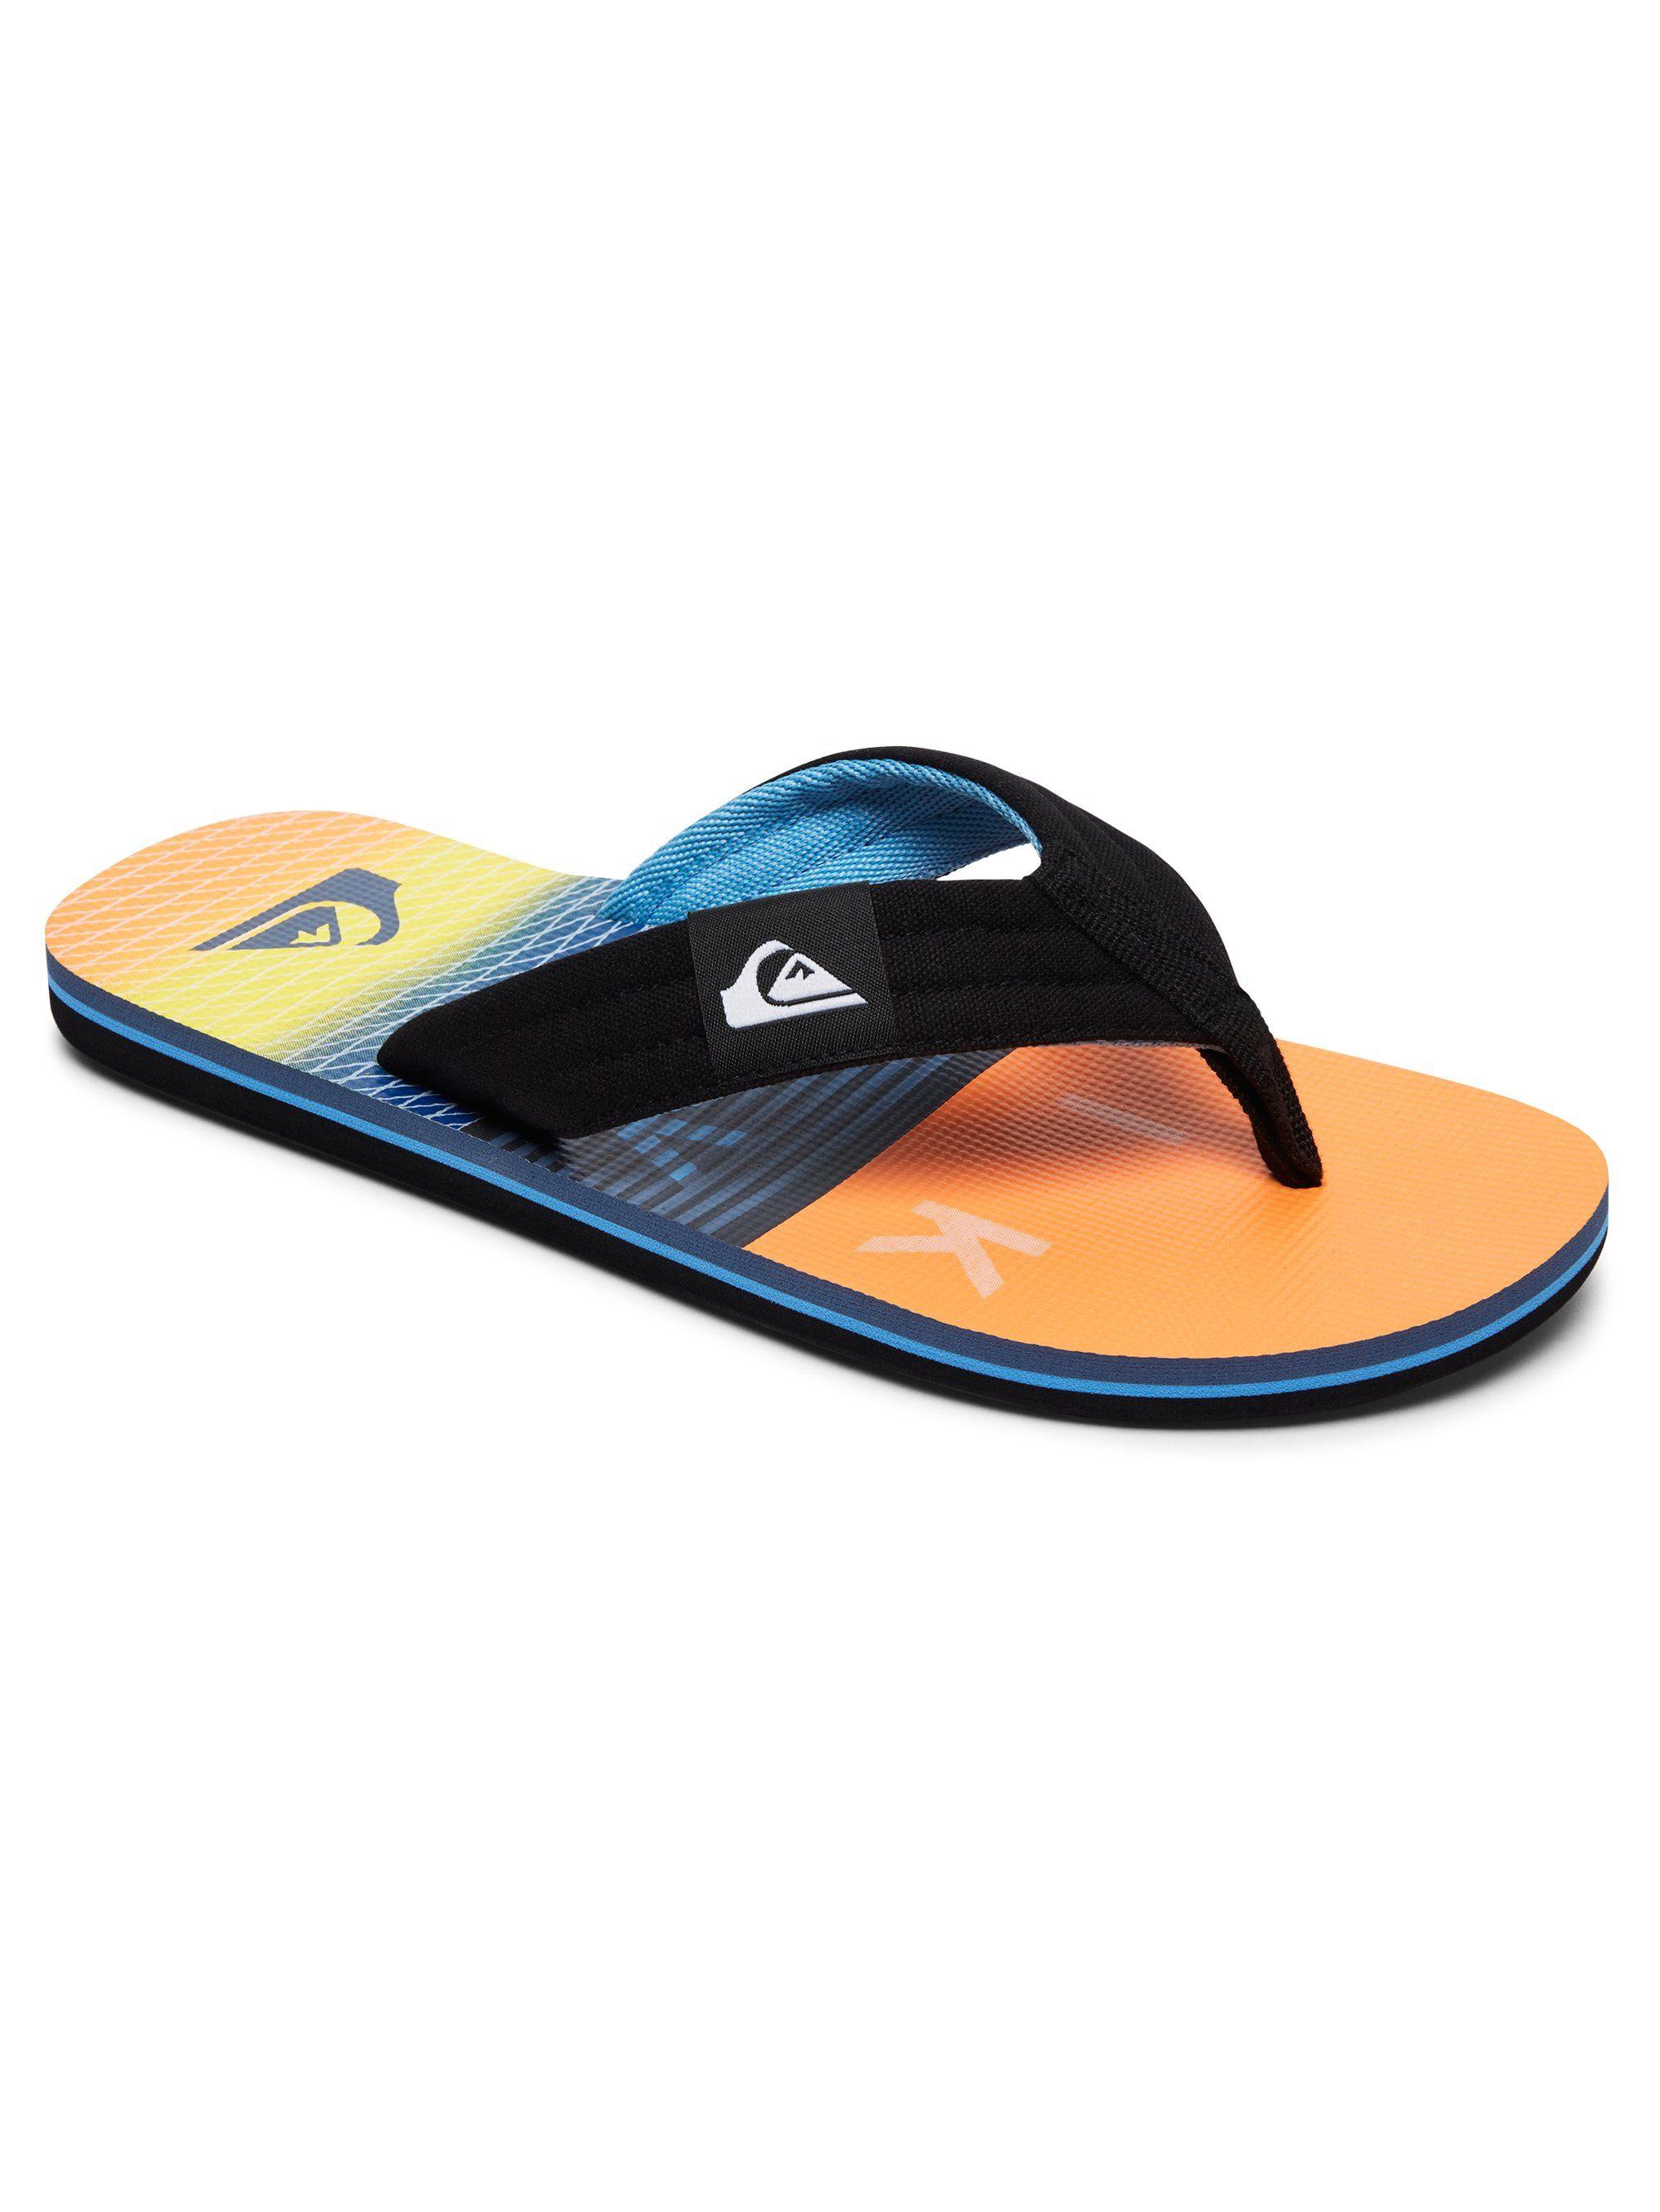 Quiksilver Zehentrenner Molokai Layback kaufen  Black#ft5_slash#orange#ft5_slash#blue